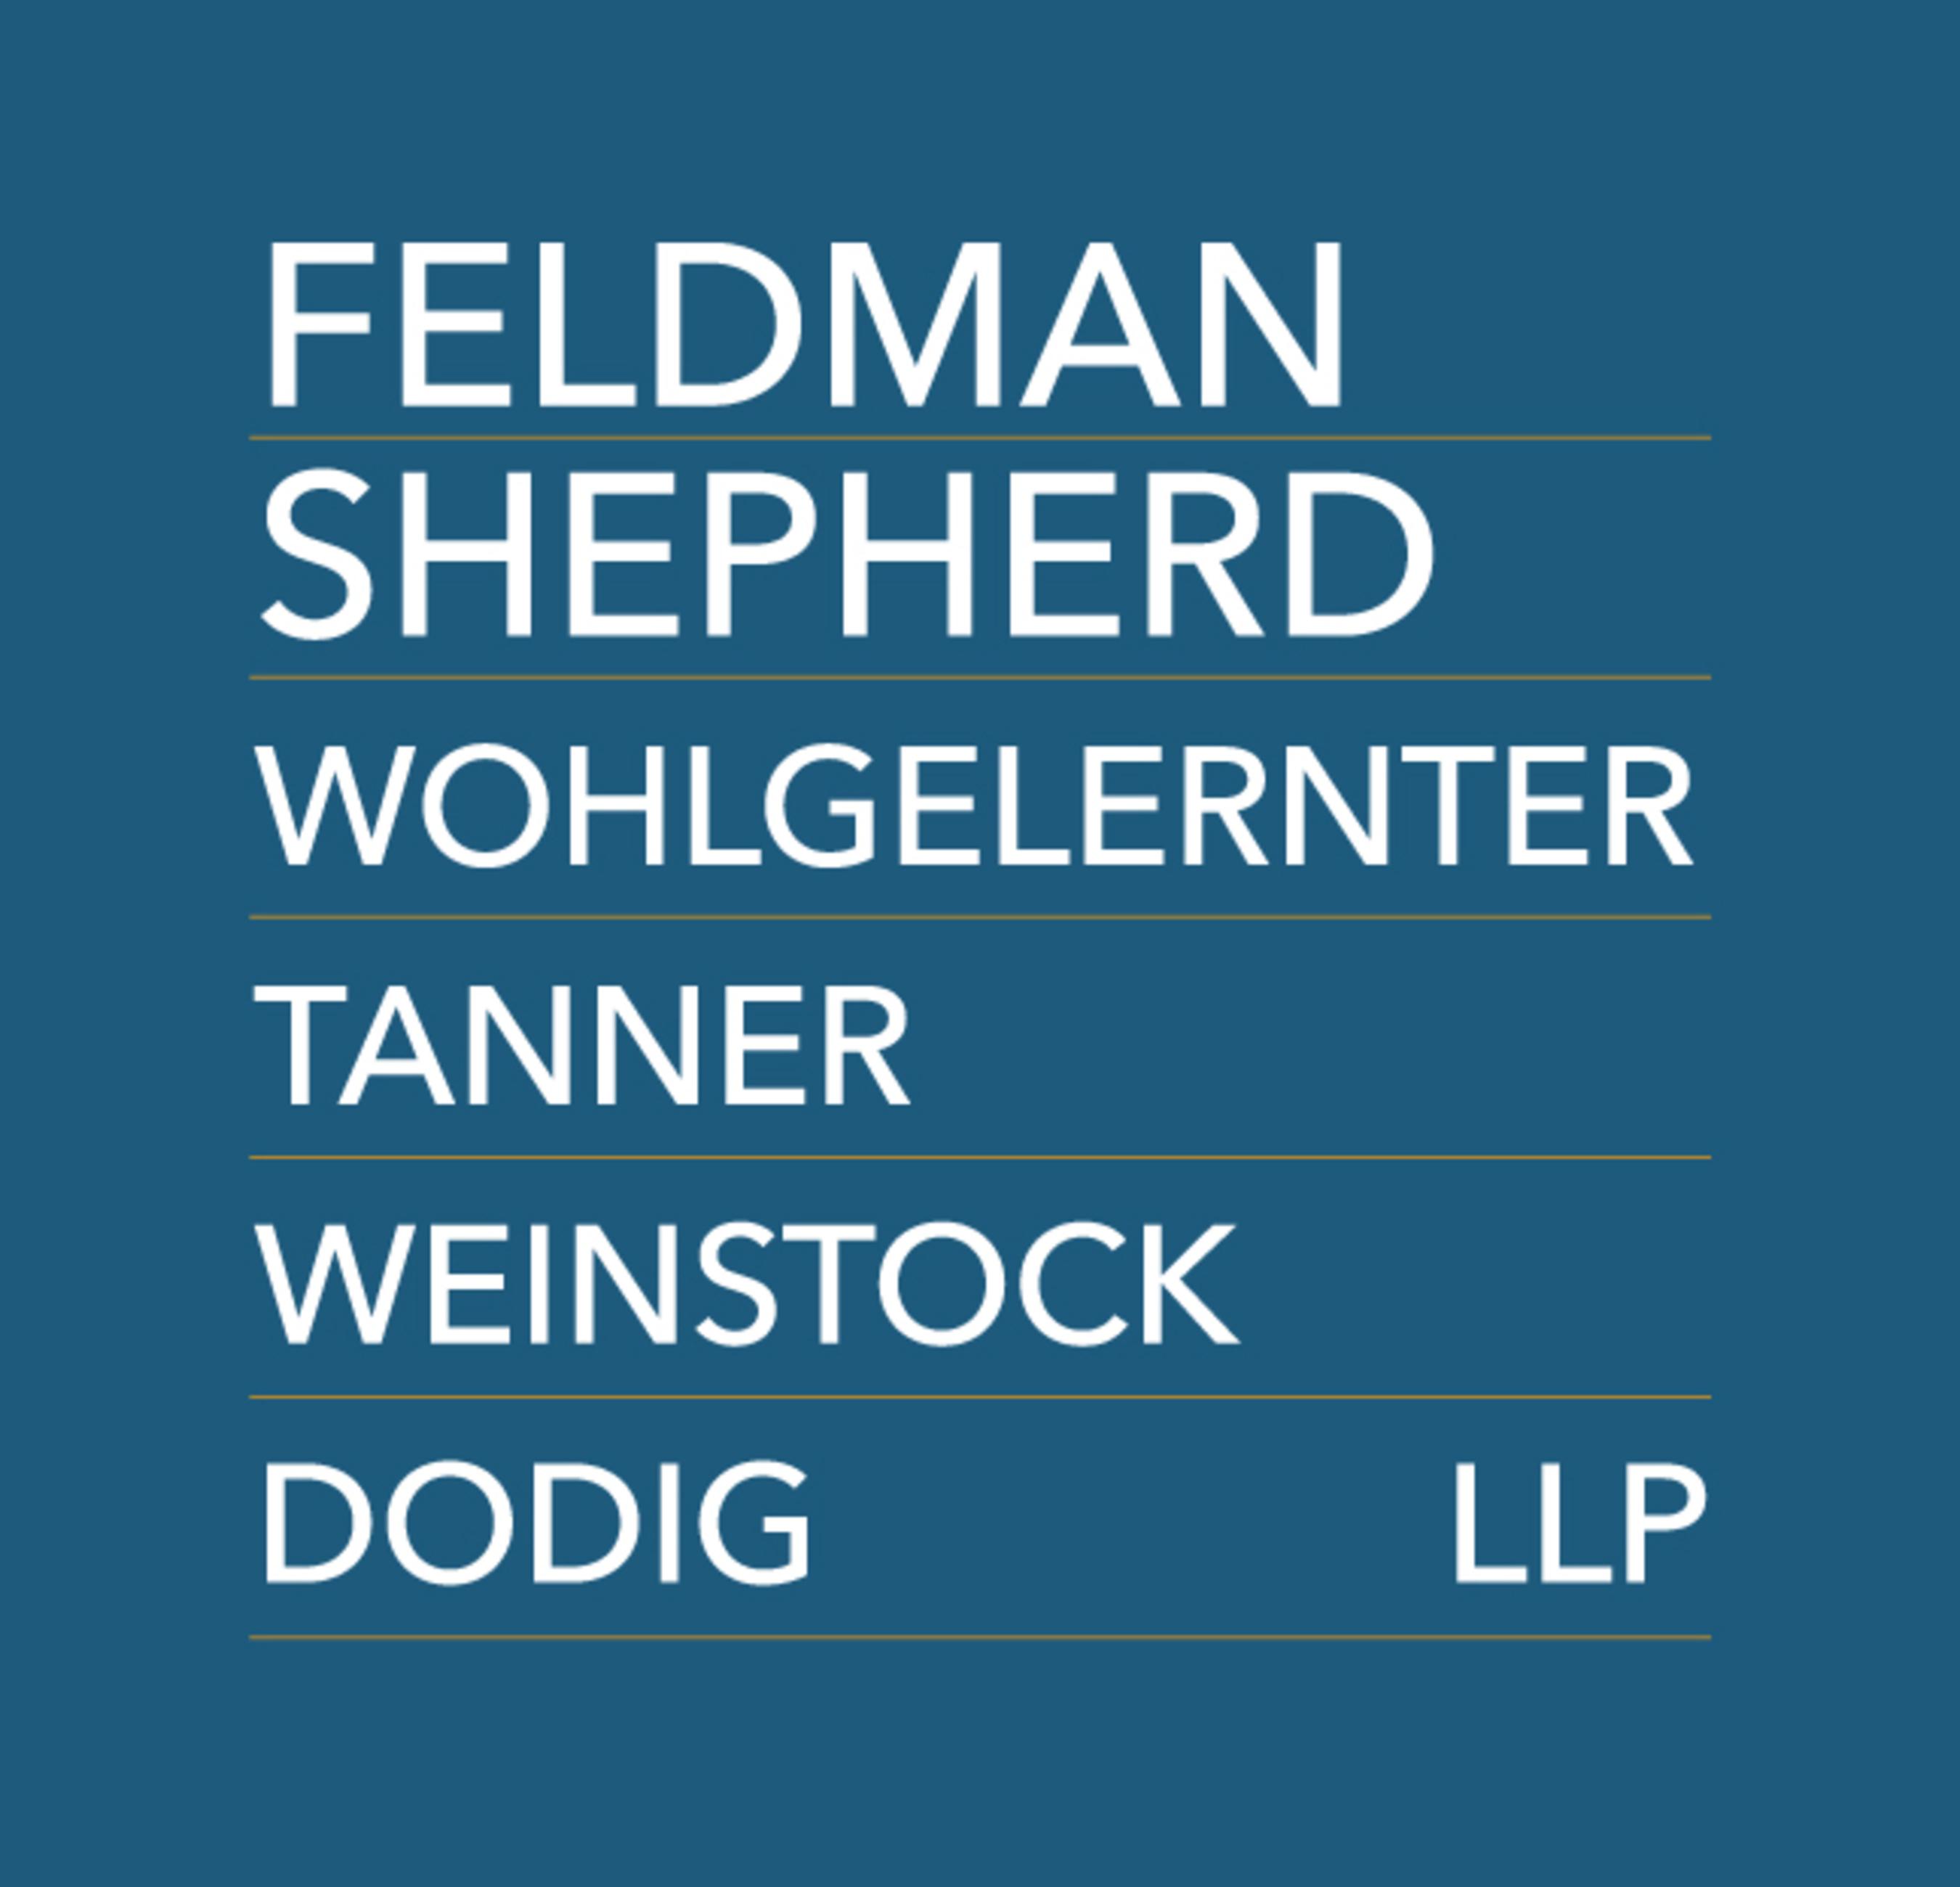 Feldman Shepherd Wohlgelernter Tanner Weinstock Dodig LLP